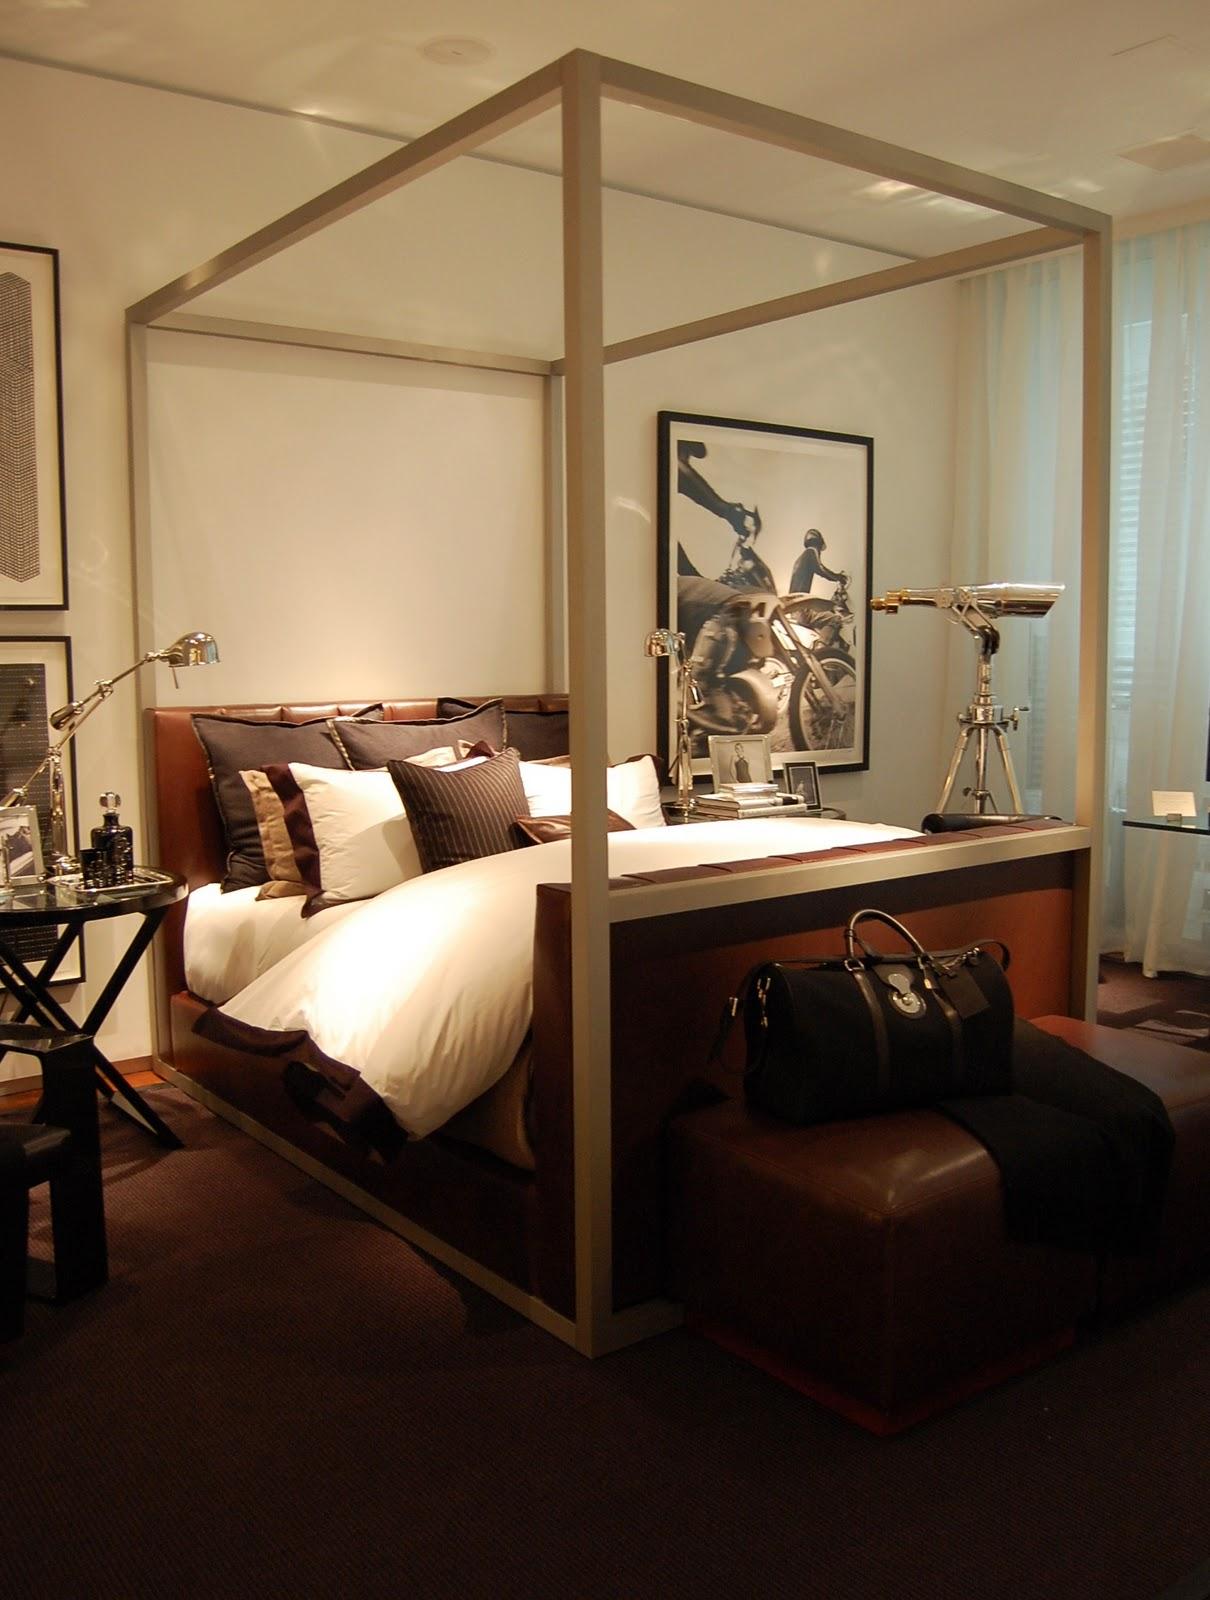 paisley curtain another episode of ralph lauren interiors. Black Bedroom Furniture Sets. Home Design Ideas